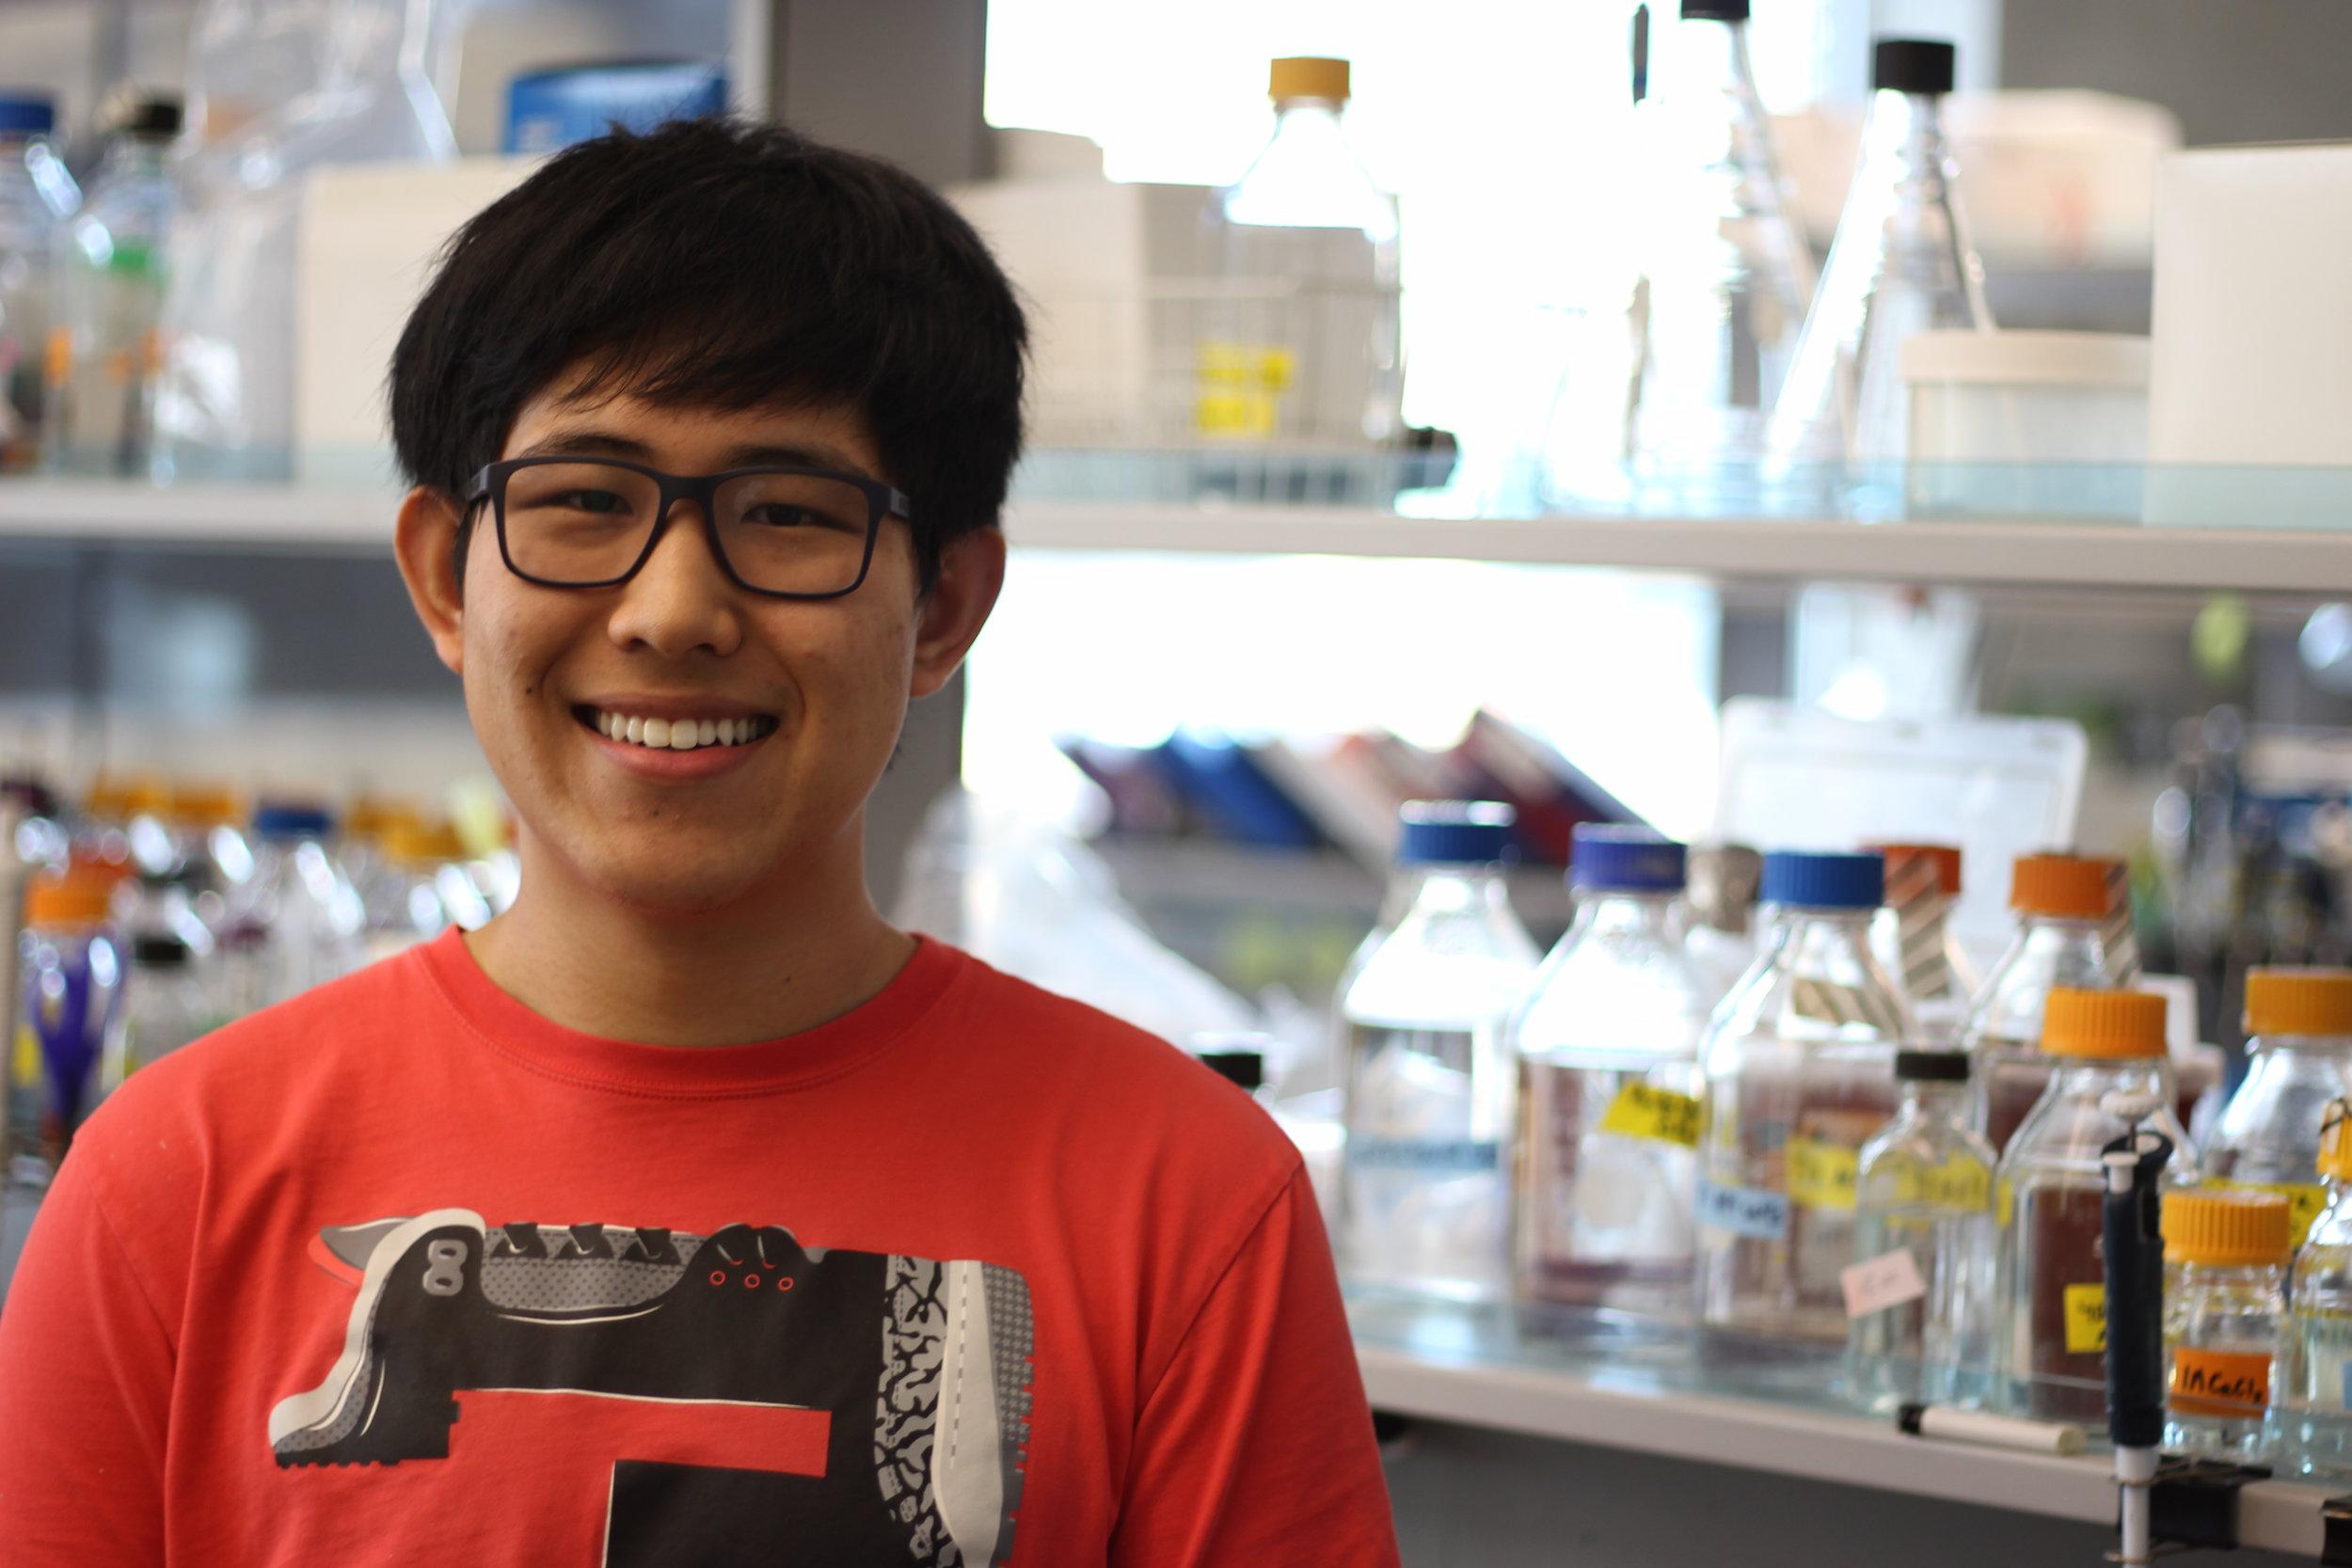 Tian Hao Zhu - Undergraduate Student